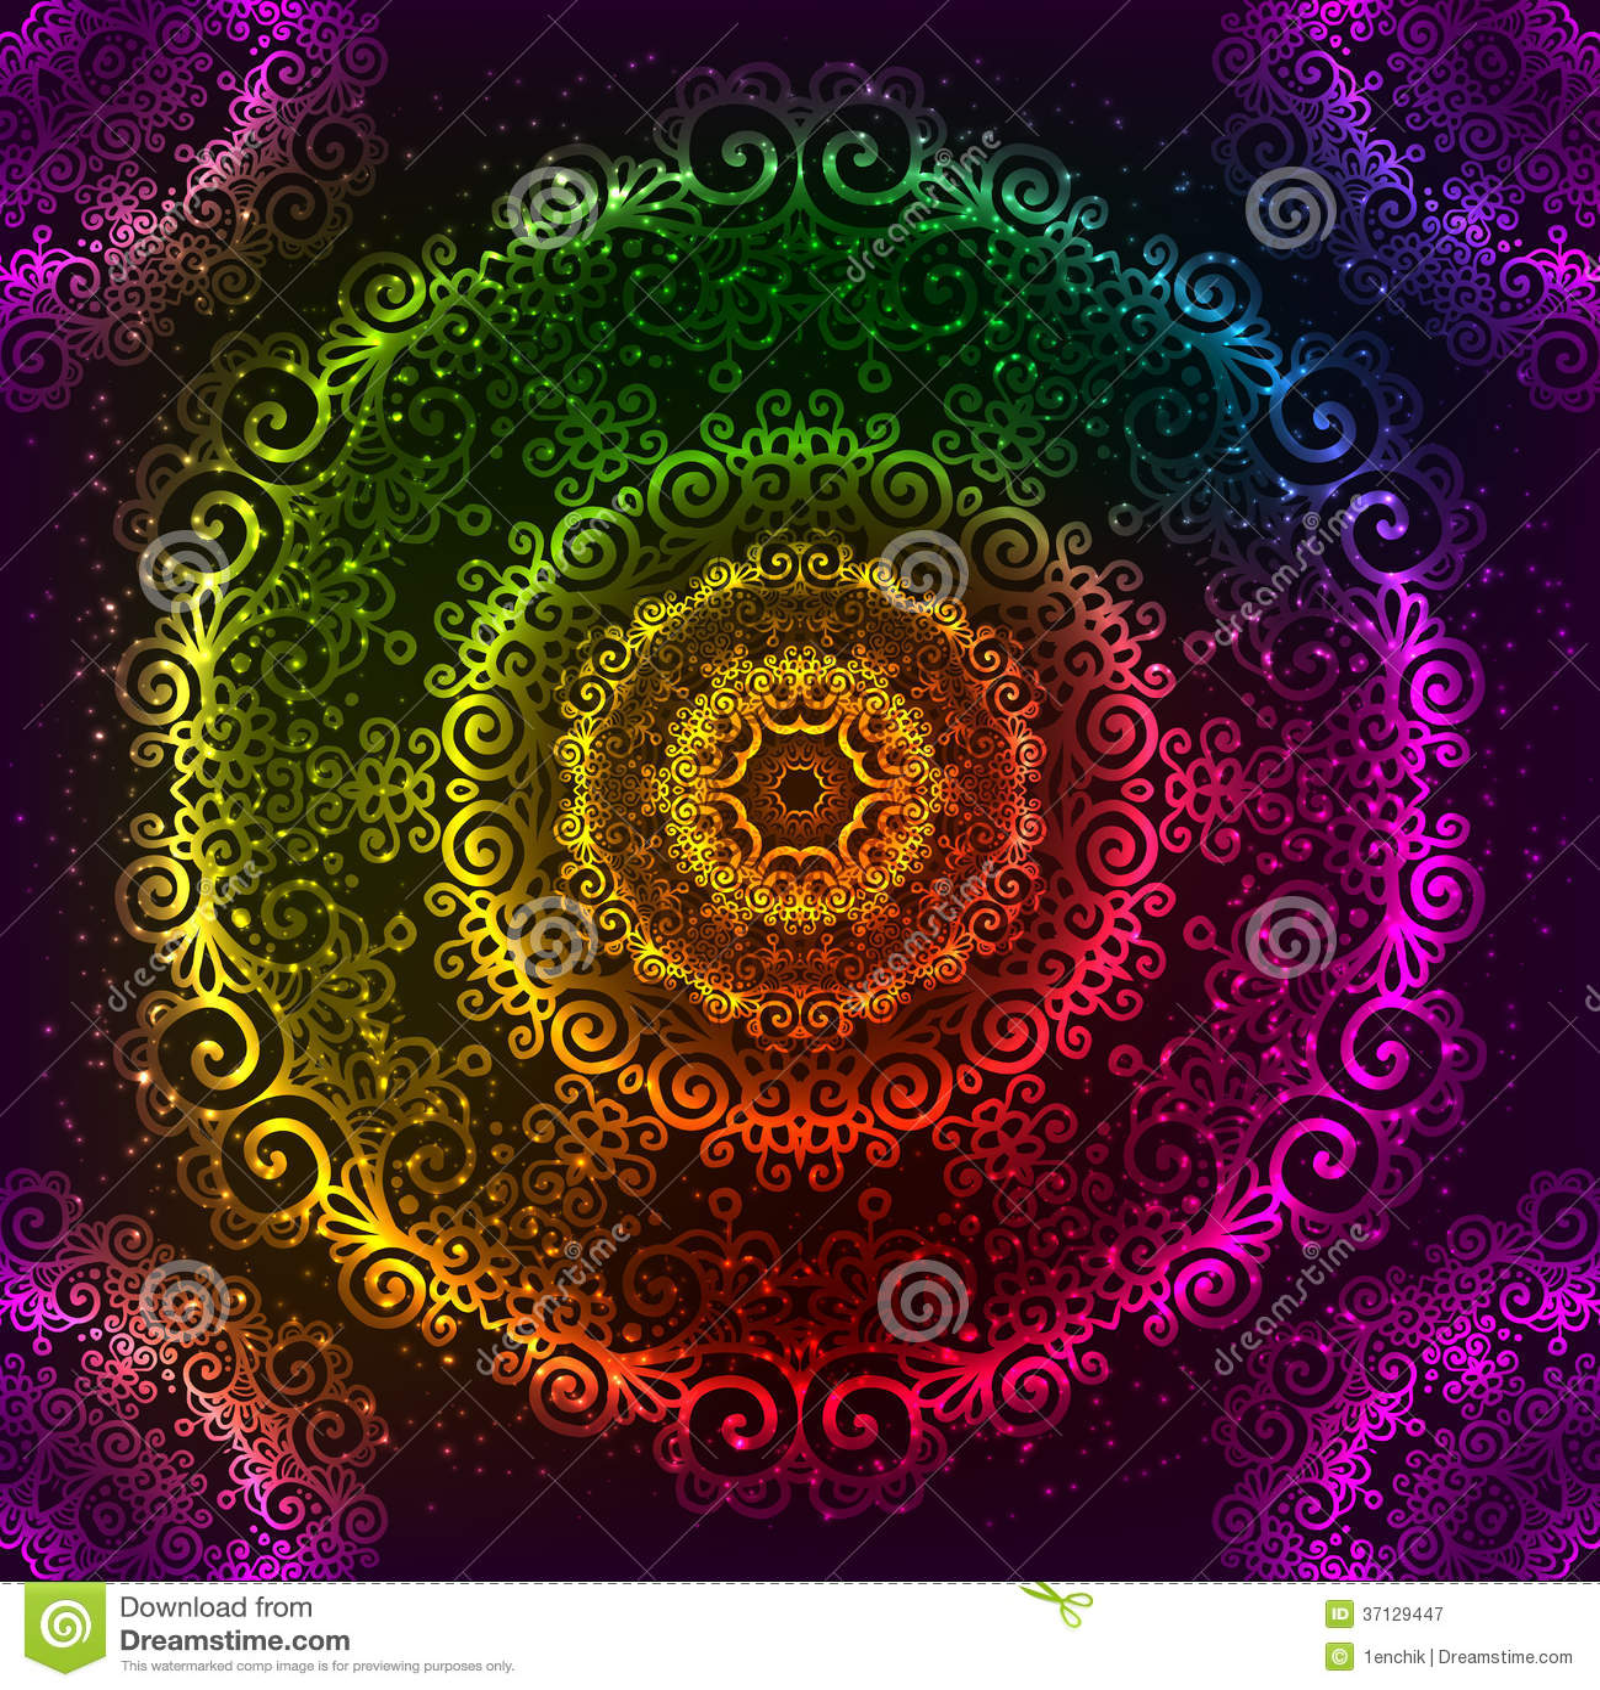 3d Rainbow Psychedeli Wallpaper Ornate Vector Rainbow Neon Mandala Royalty Free Stock